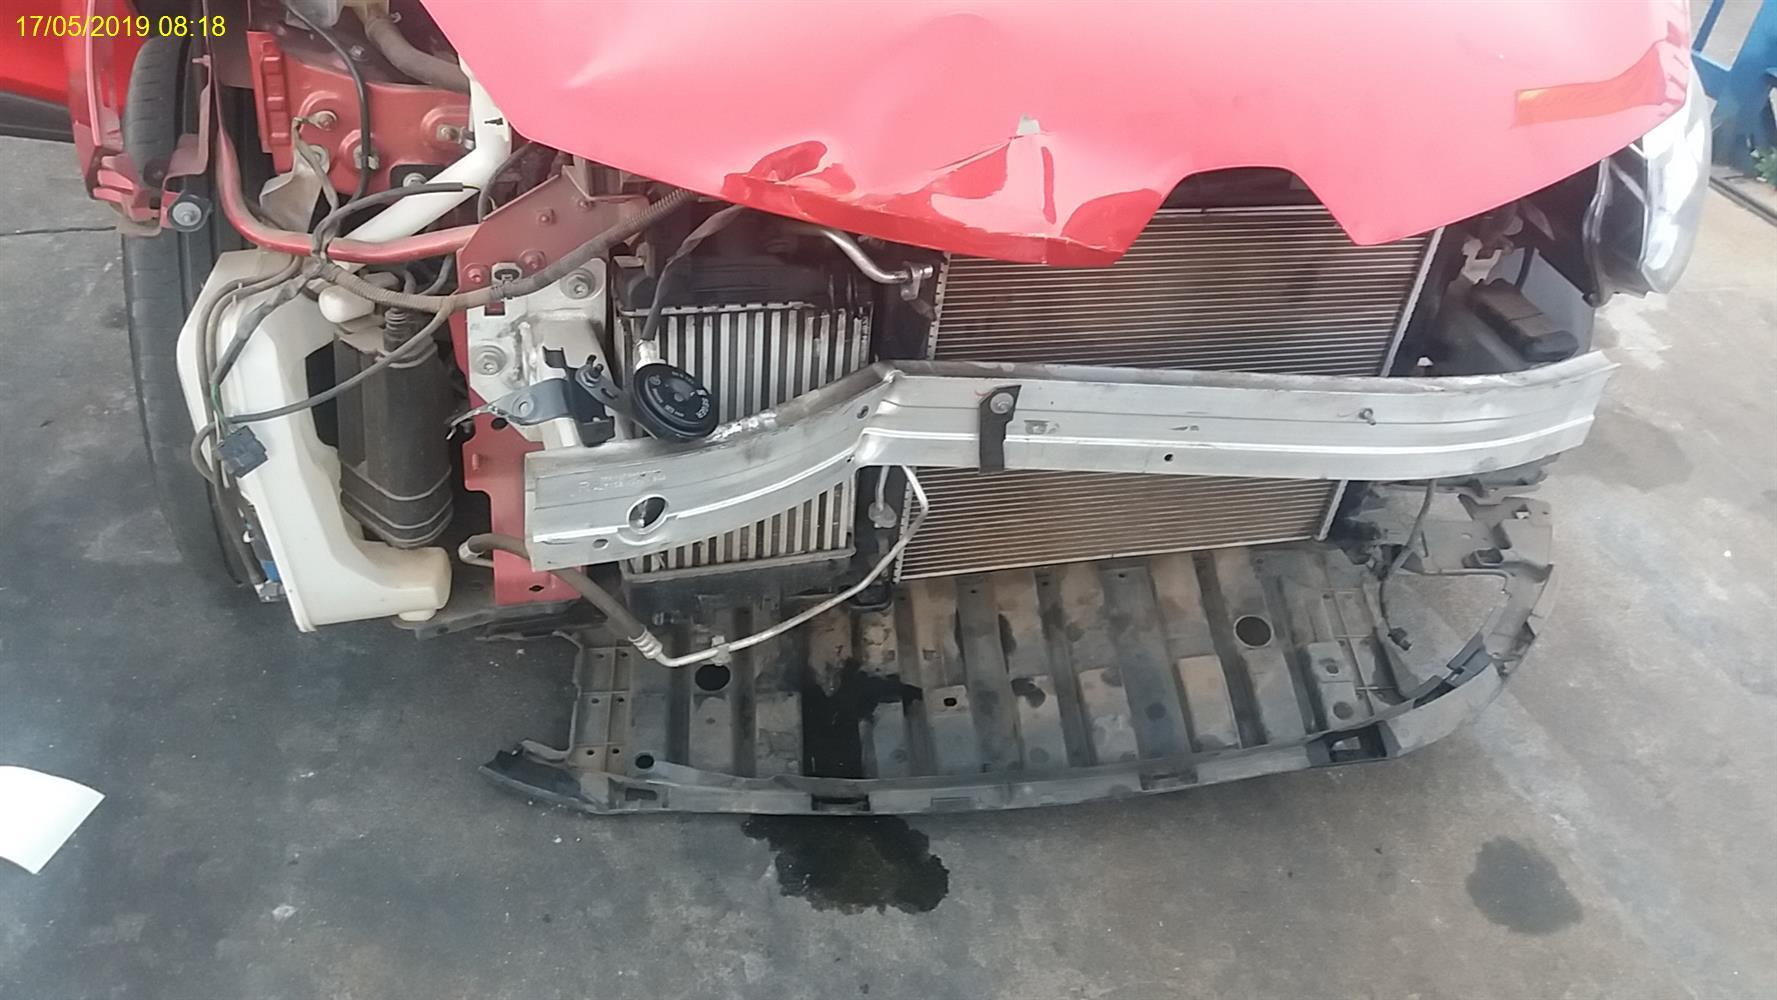 RENAULT CLIO IV CODE 2 Ready for Rebuild